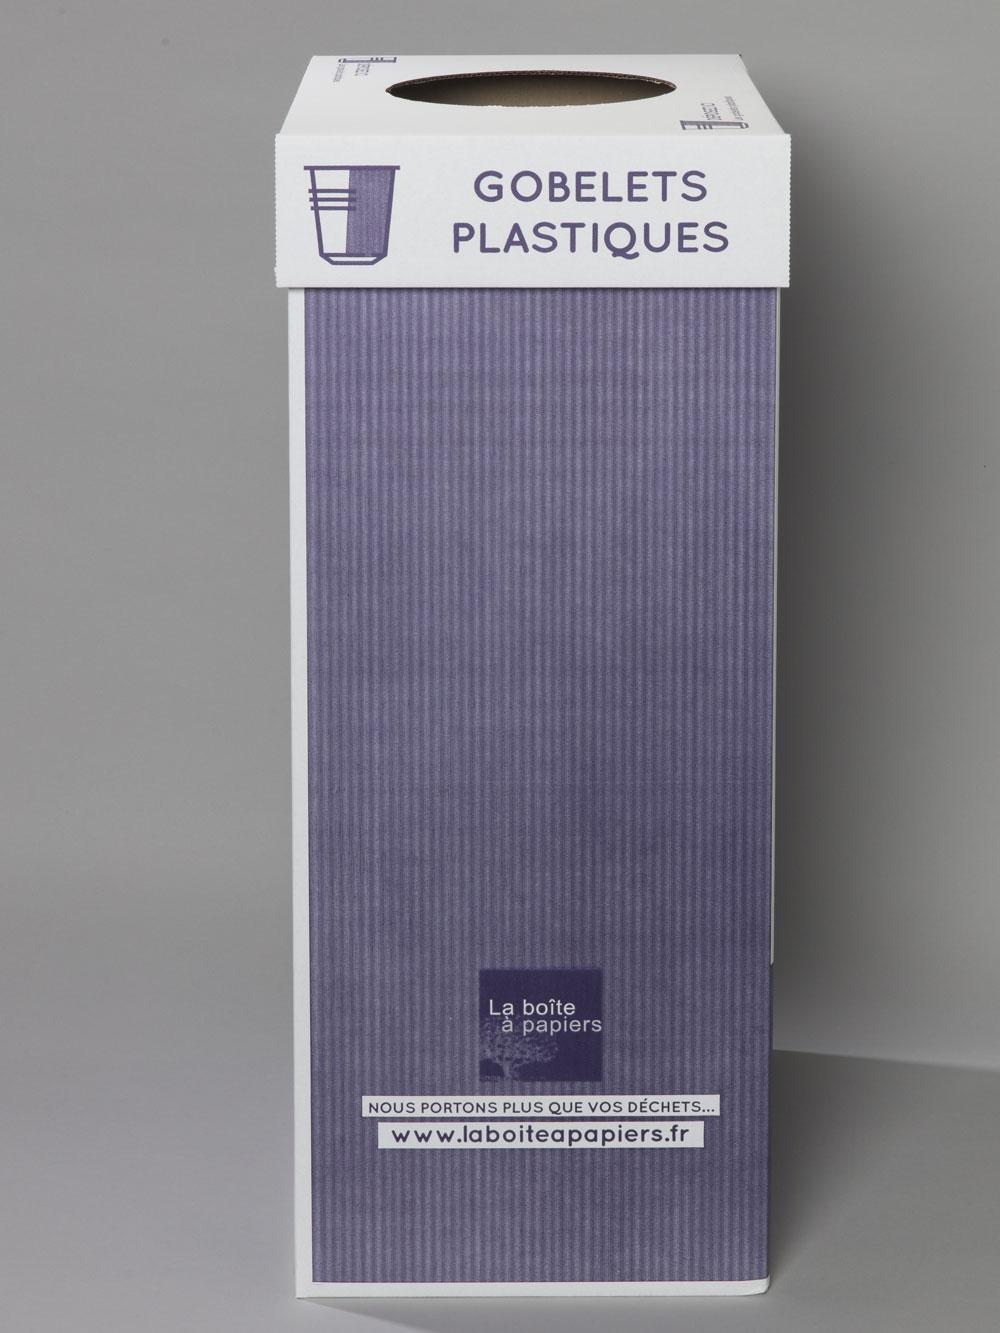 carton-recyclage-gobelets-plastiques